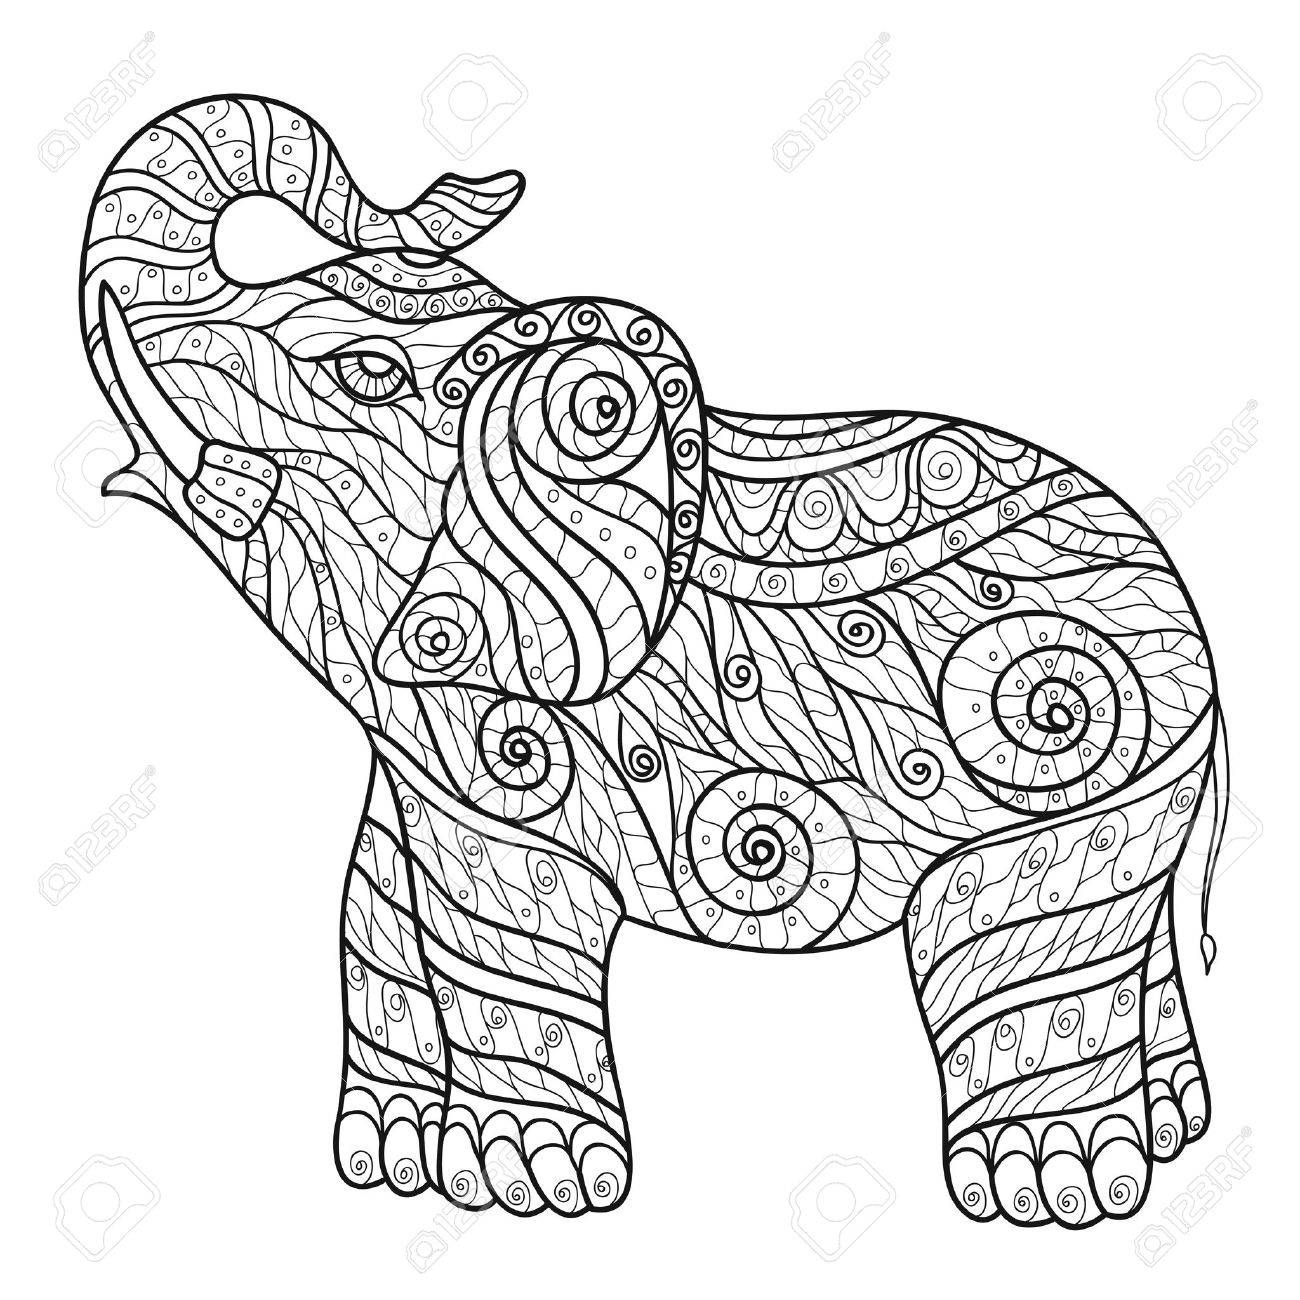 Stilisierte Elefant In Einem Grafik Stil Vektor Illustration Zentangle Malvorlagen Tiere Mandala Malvorlagen Wenn Du Mal Buch